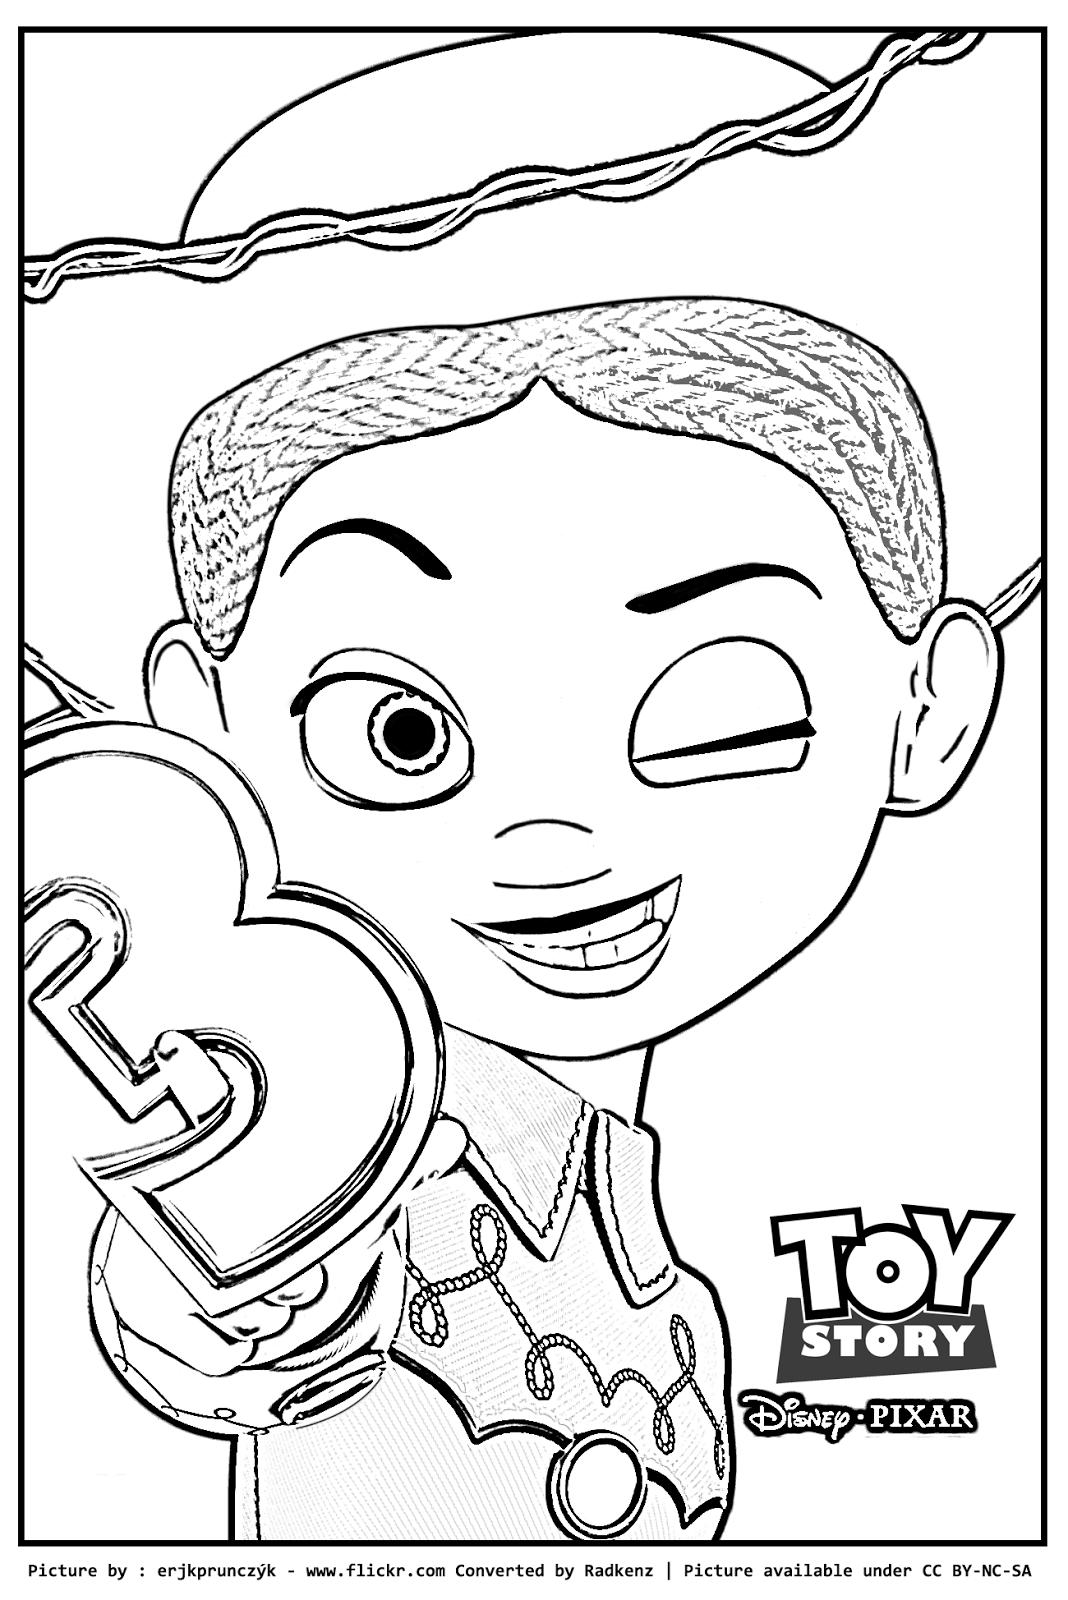 Toy Story 1 Art